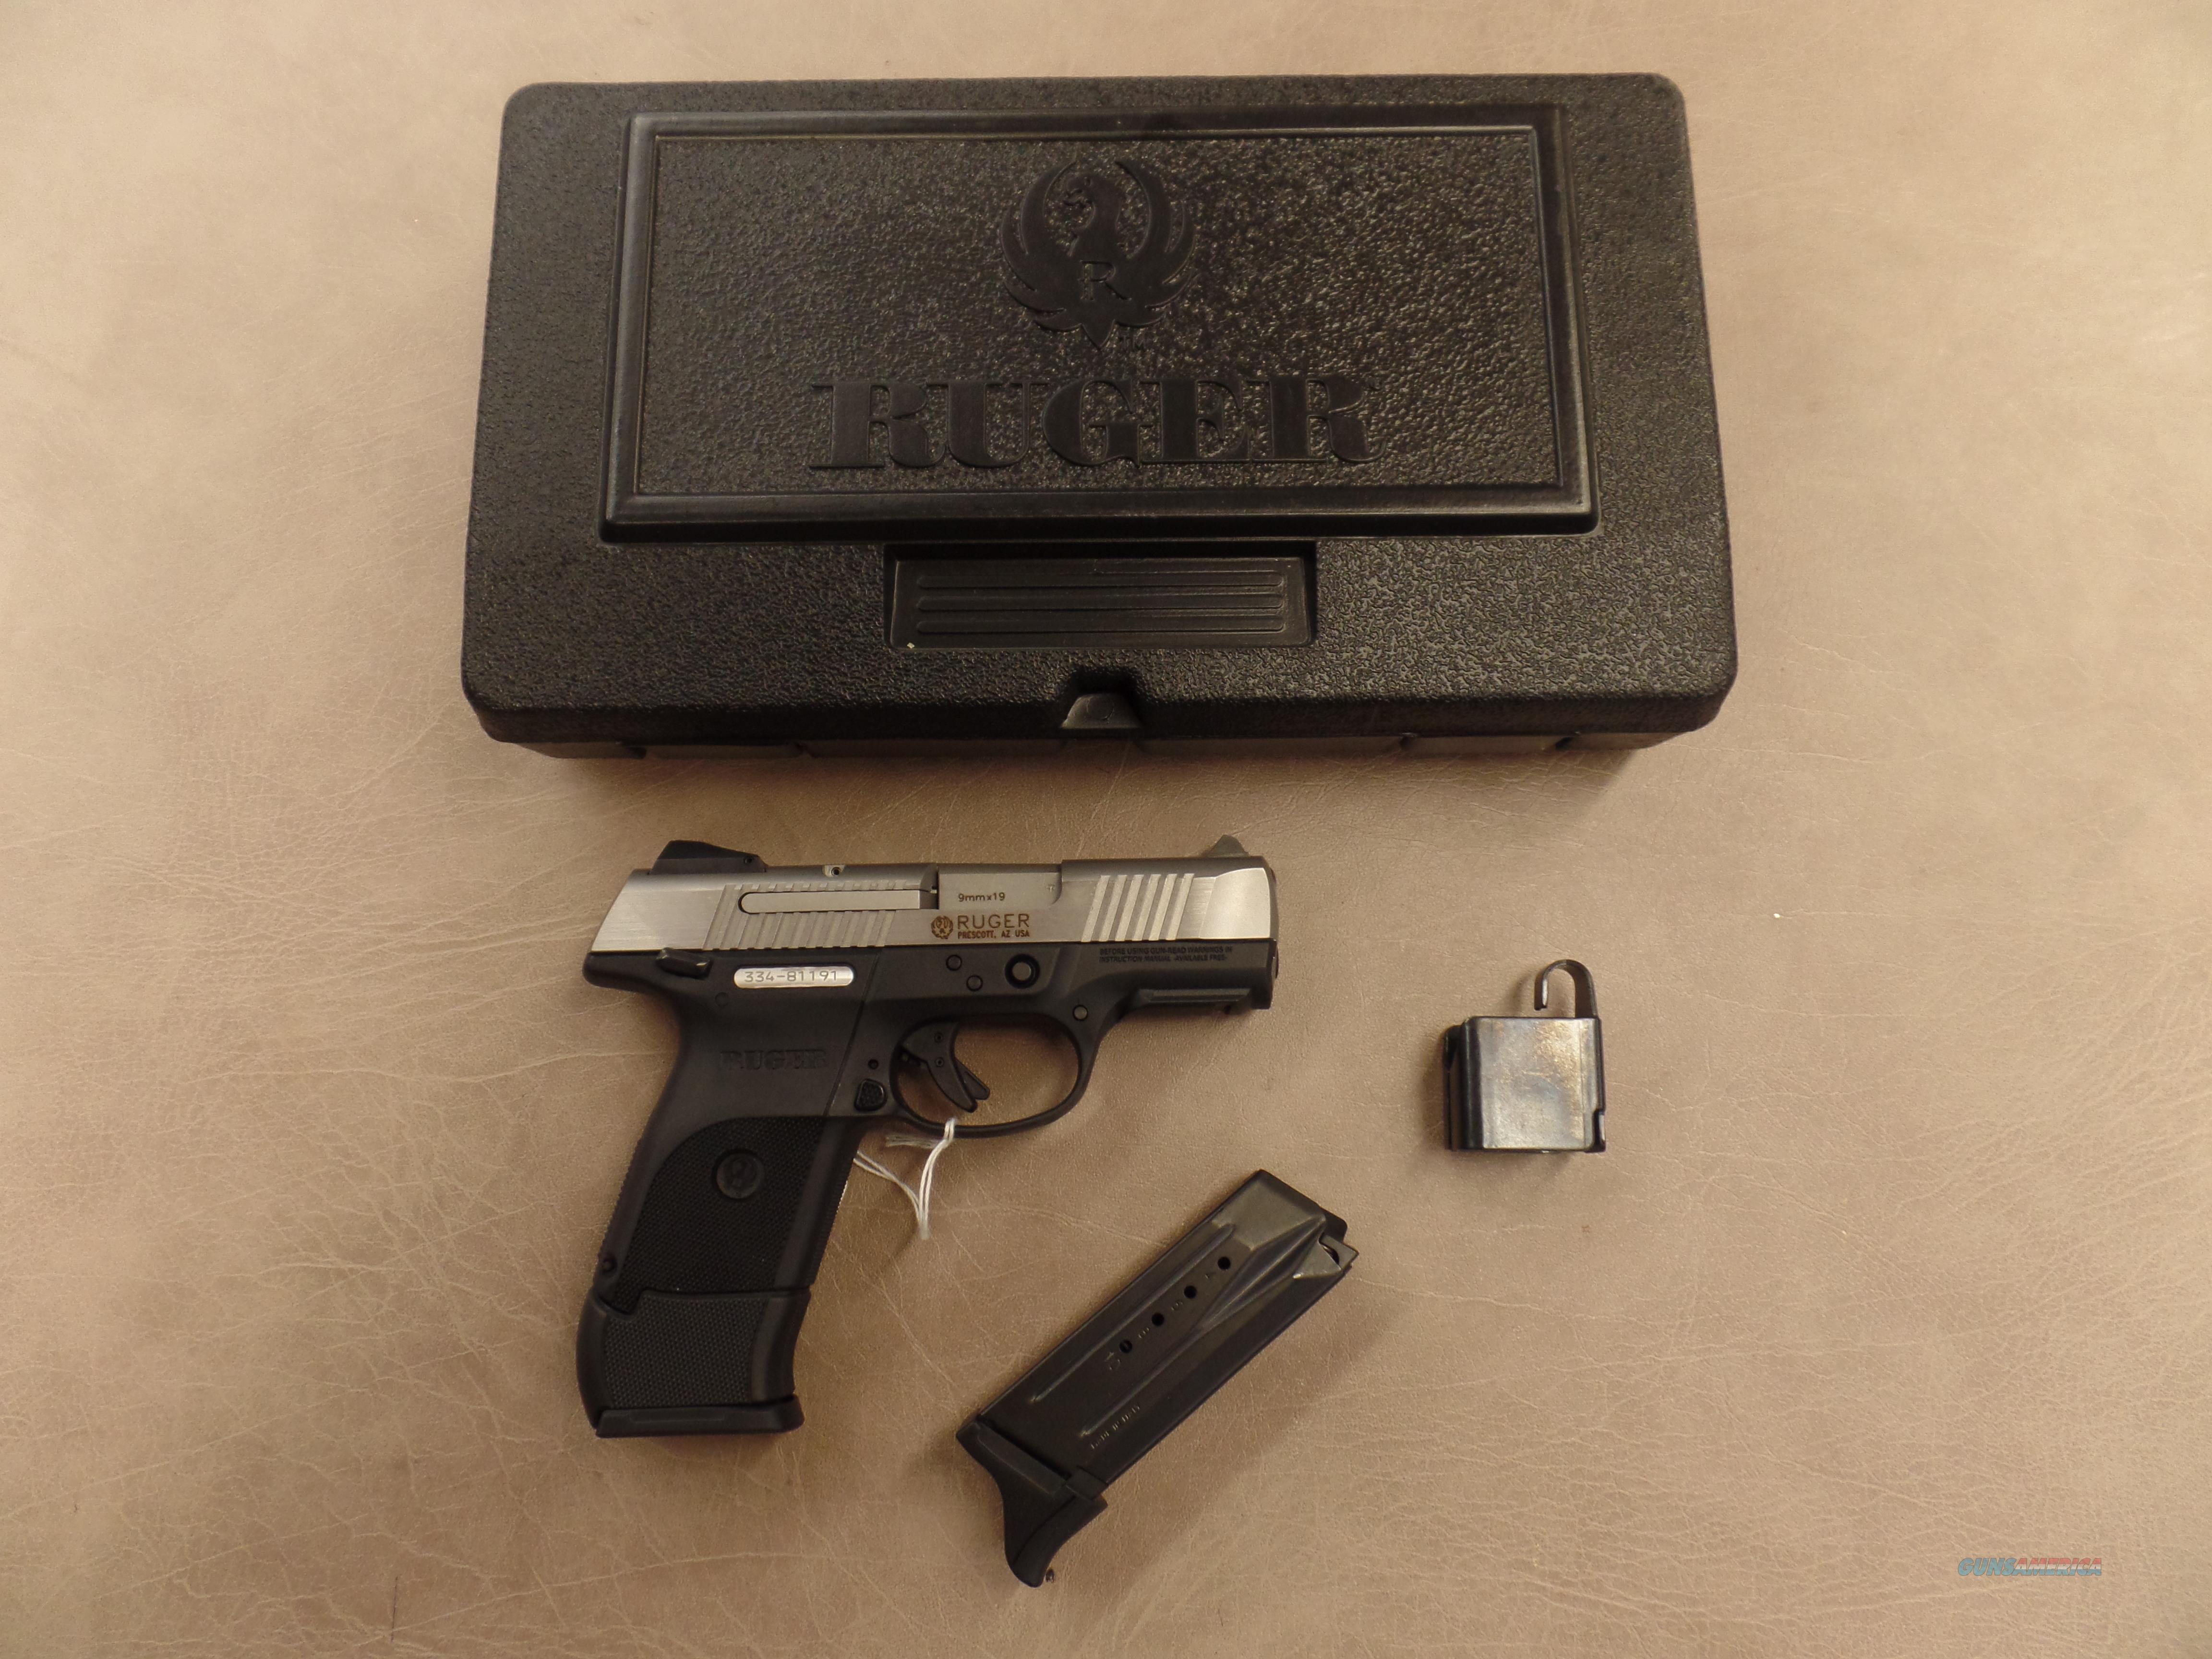 Ruger Model SR9C  Guns > Pistols > Ruger Semi-Auto Pistols > SR Family > SR9C